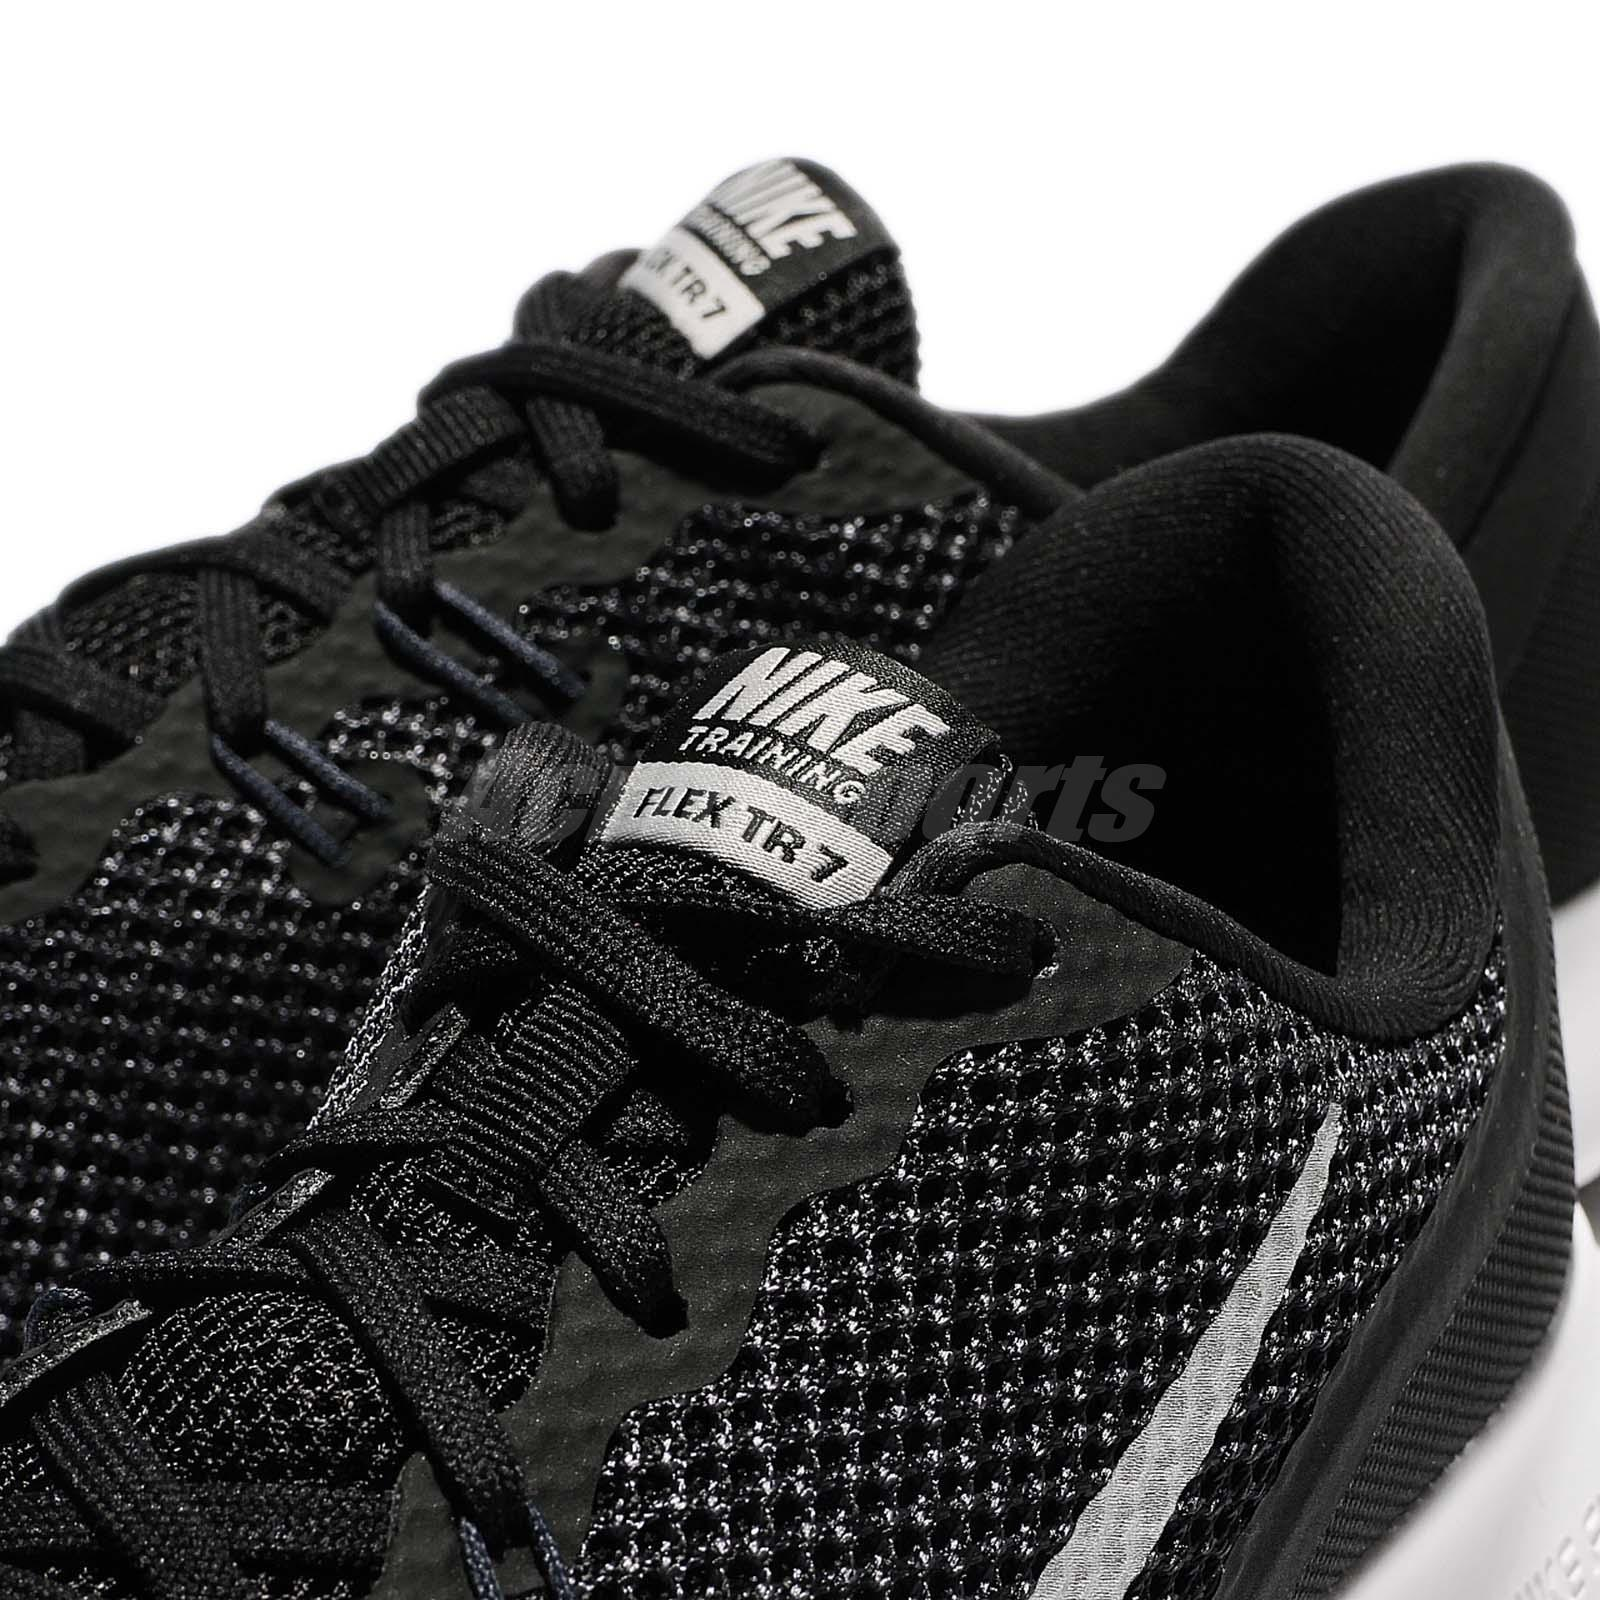 Training Nike Wmns Women about 898479 7 Trainer Black Sneaker White Details VII Shoes Flex 001 0NnXwOPk8Z